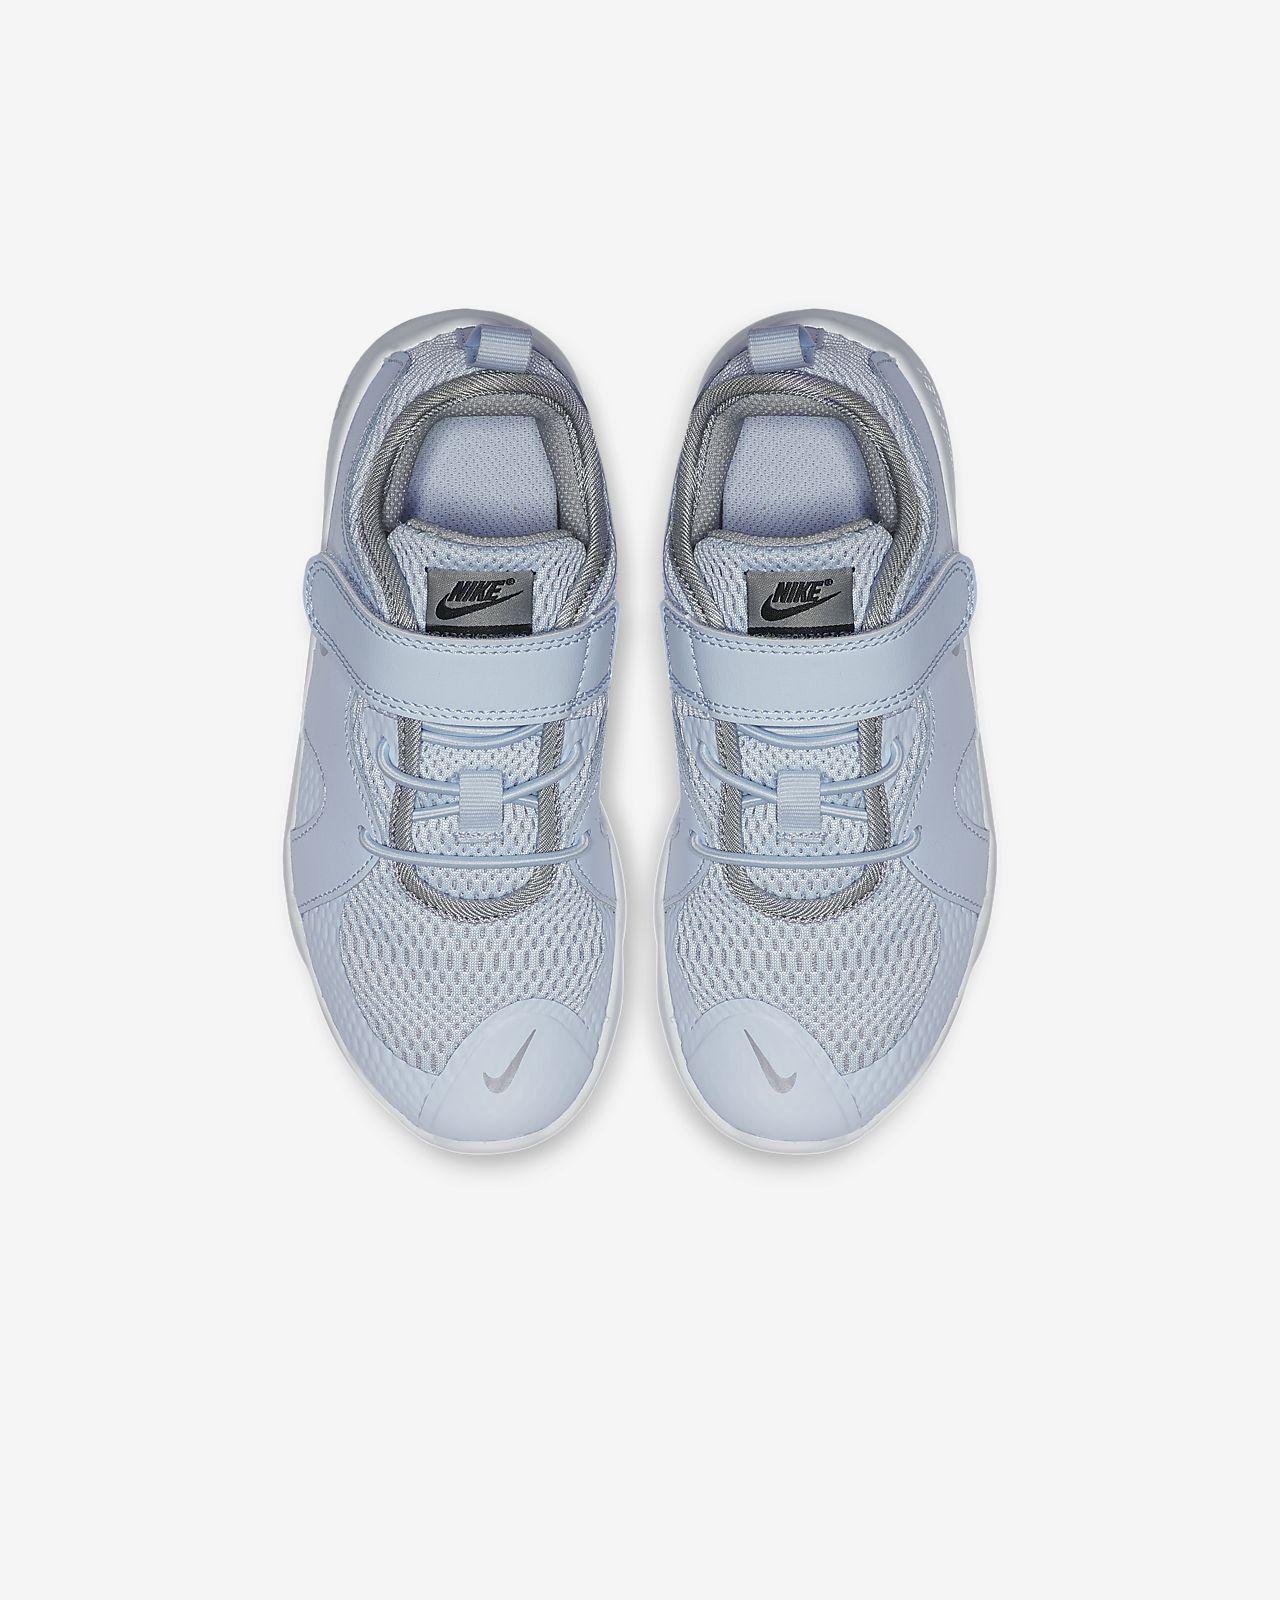 01d5b899e8 Nike Flex Contact 3 Little Kids' Shoe. Nike.com